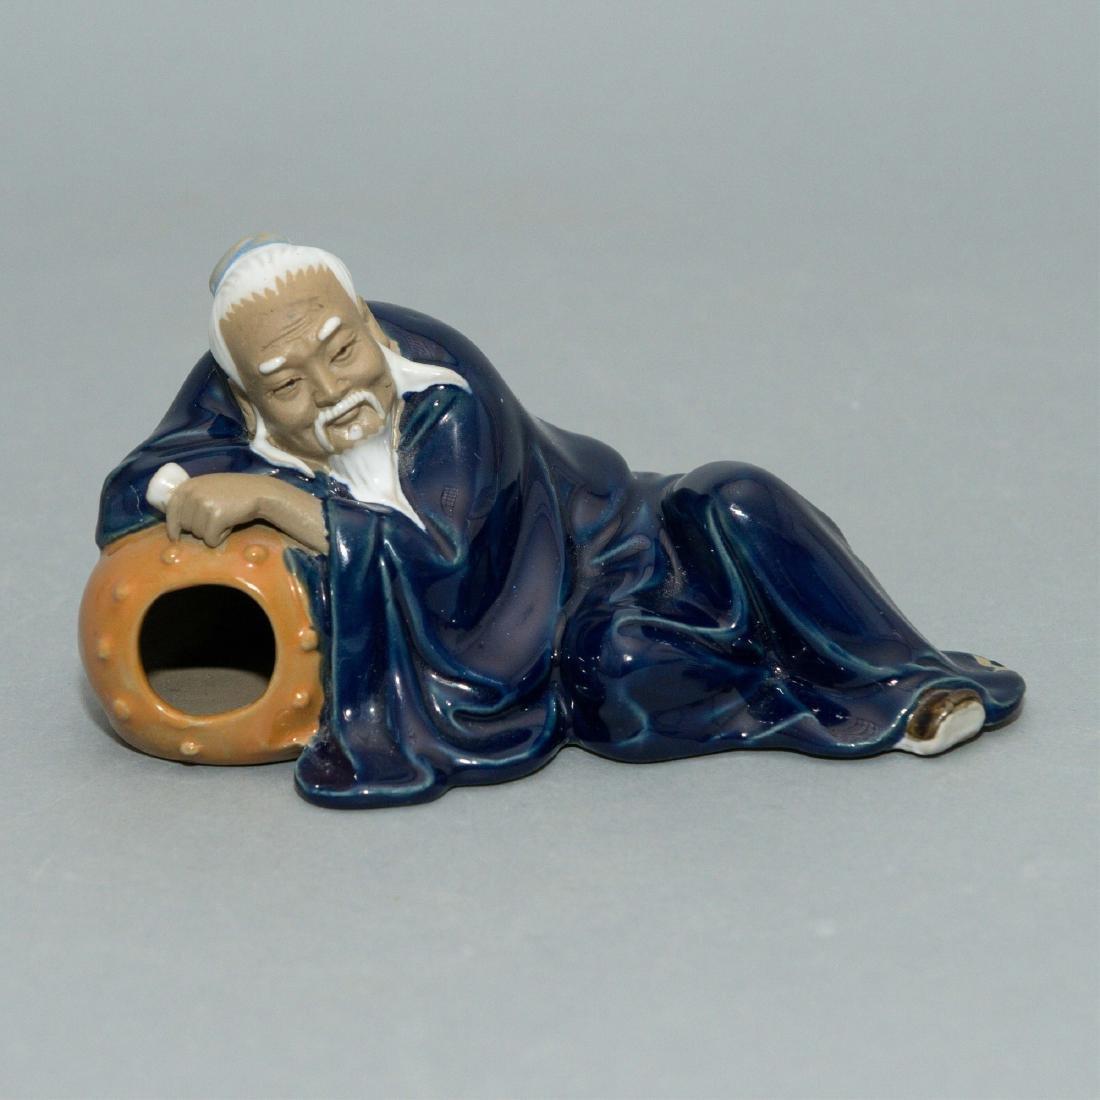 CHINESE MUDMAN FIGURINE, MID-20TH CENTURY